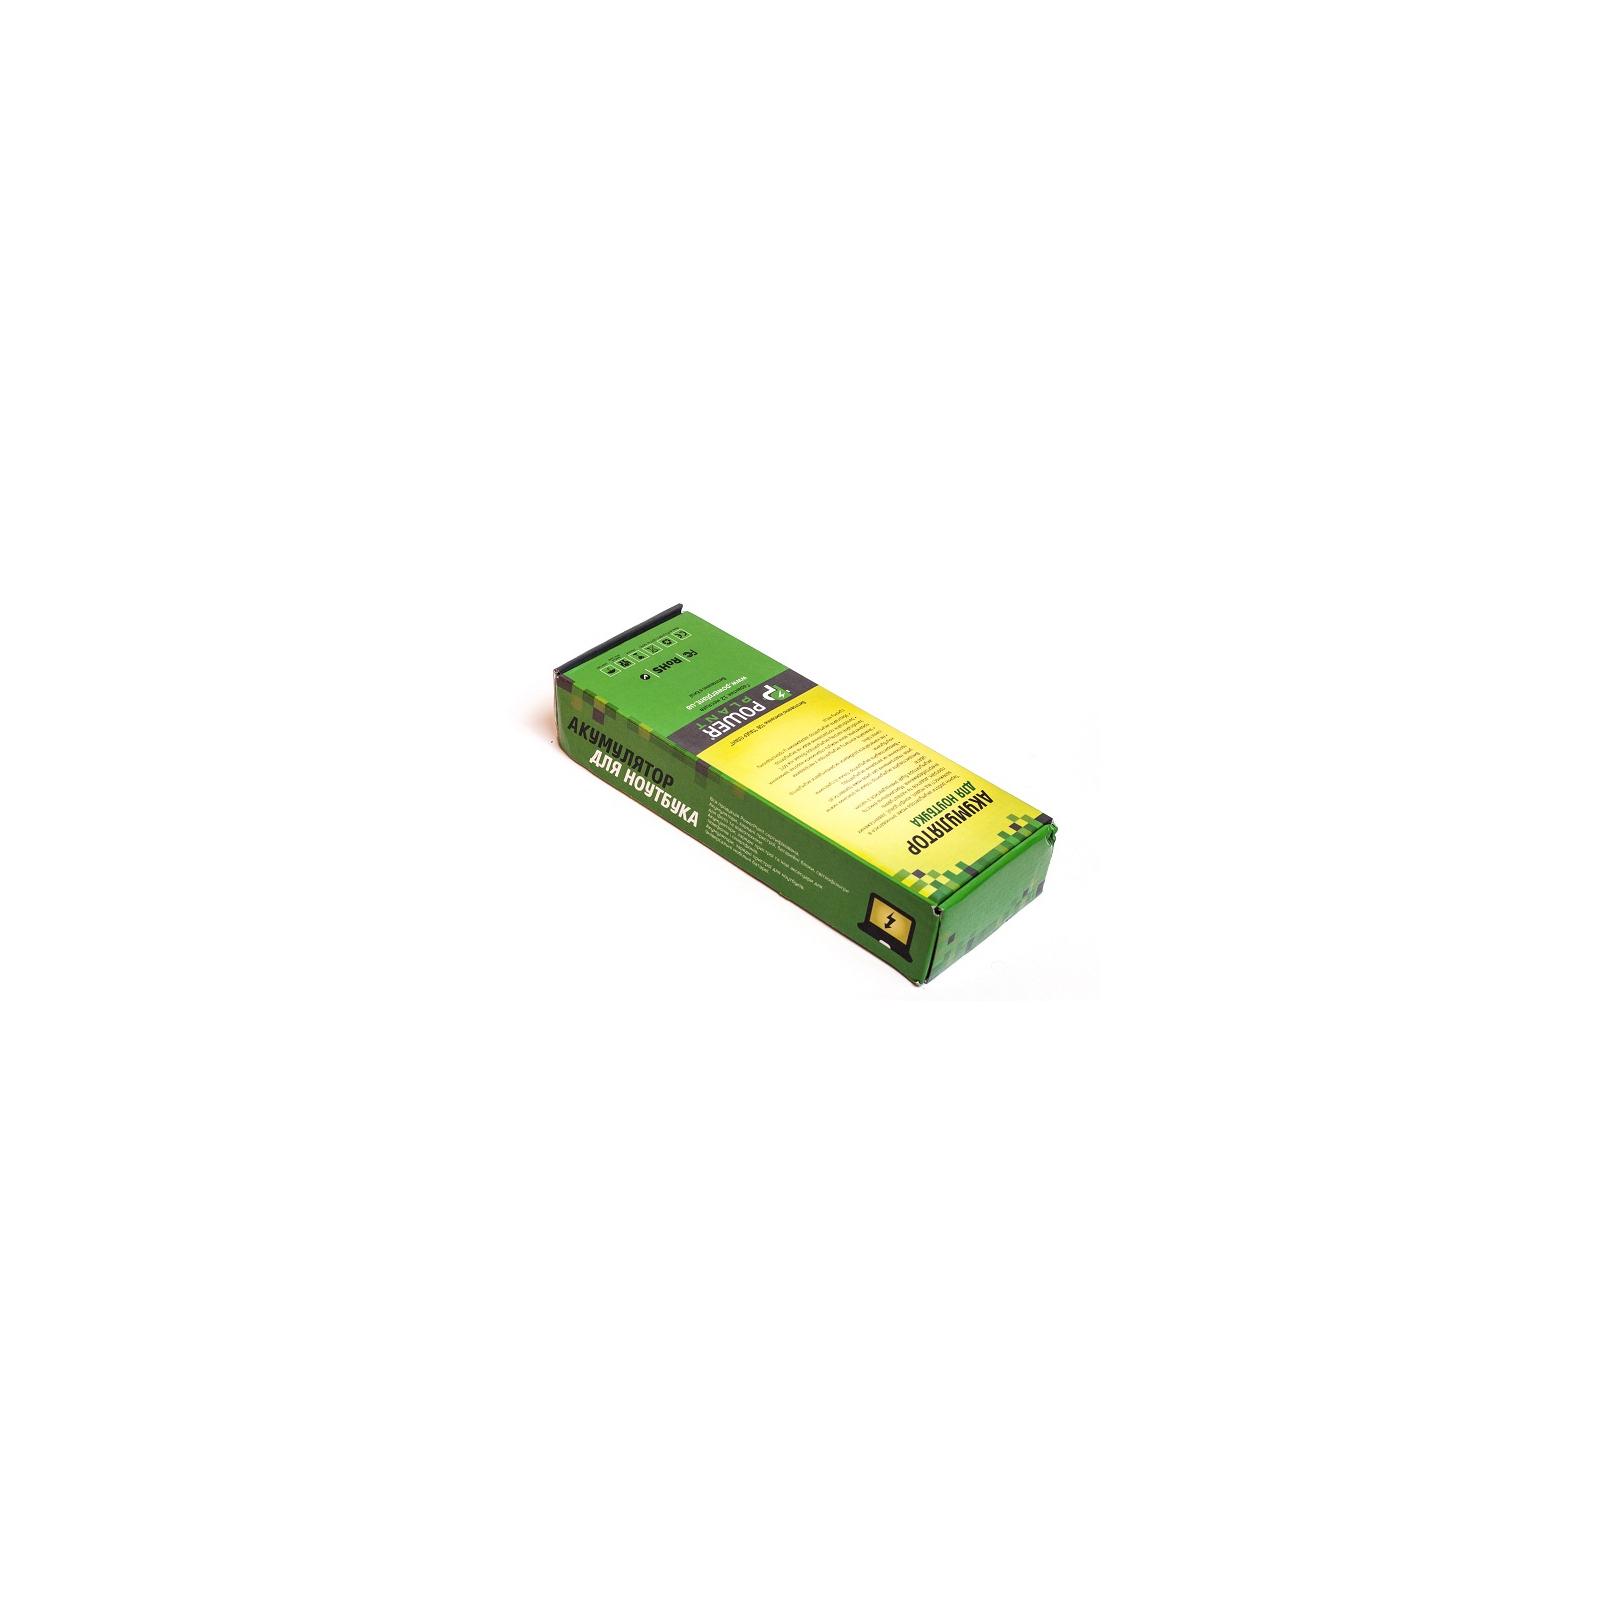 Аккумулятор для ноутбука LENOVO 3000 (FRU 92P1186, LE N100 3S2P) 10.8V 5200mAh PowerPlant (NB00000032) изображение 2